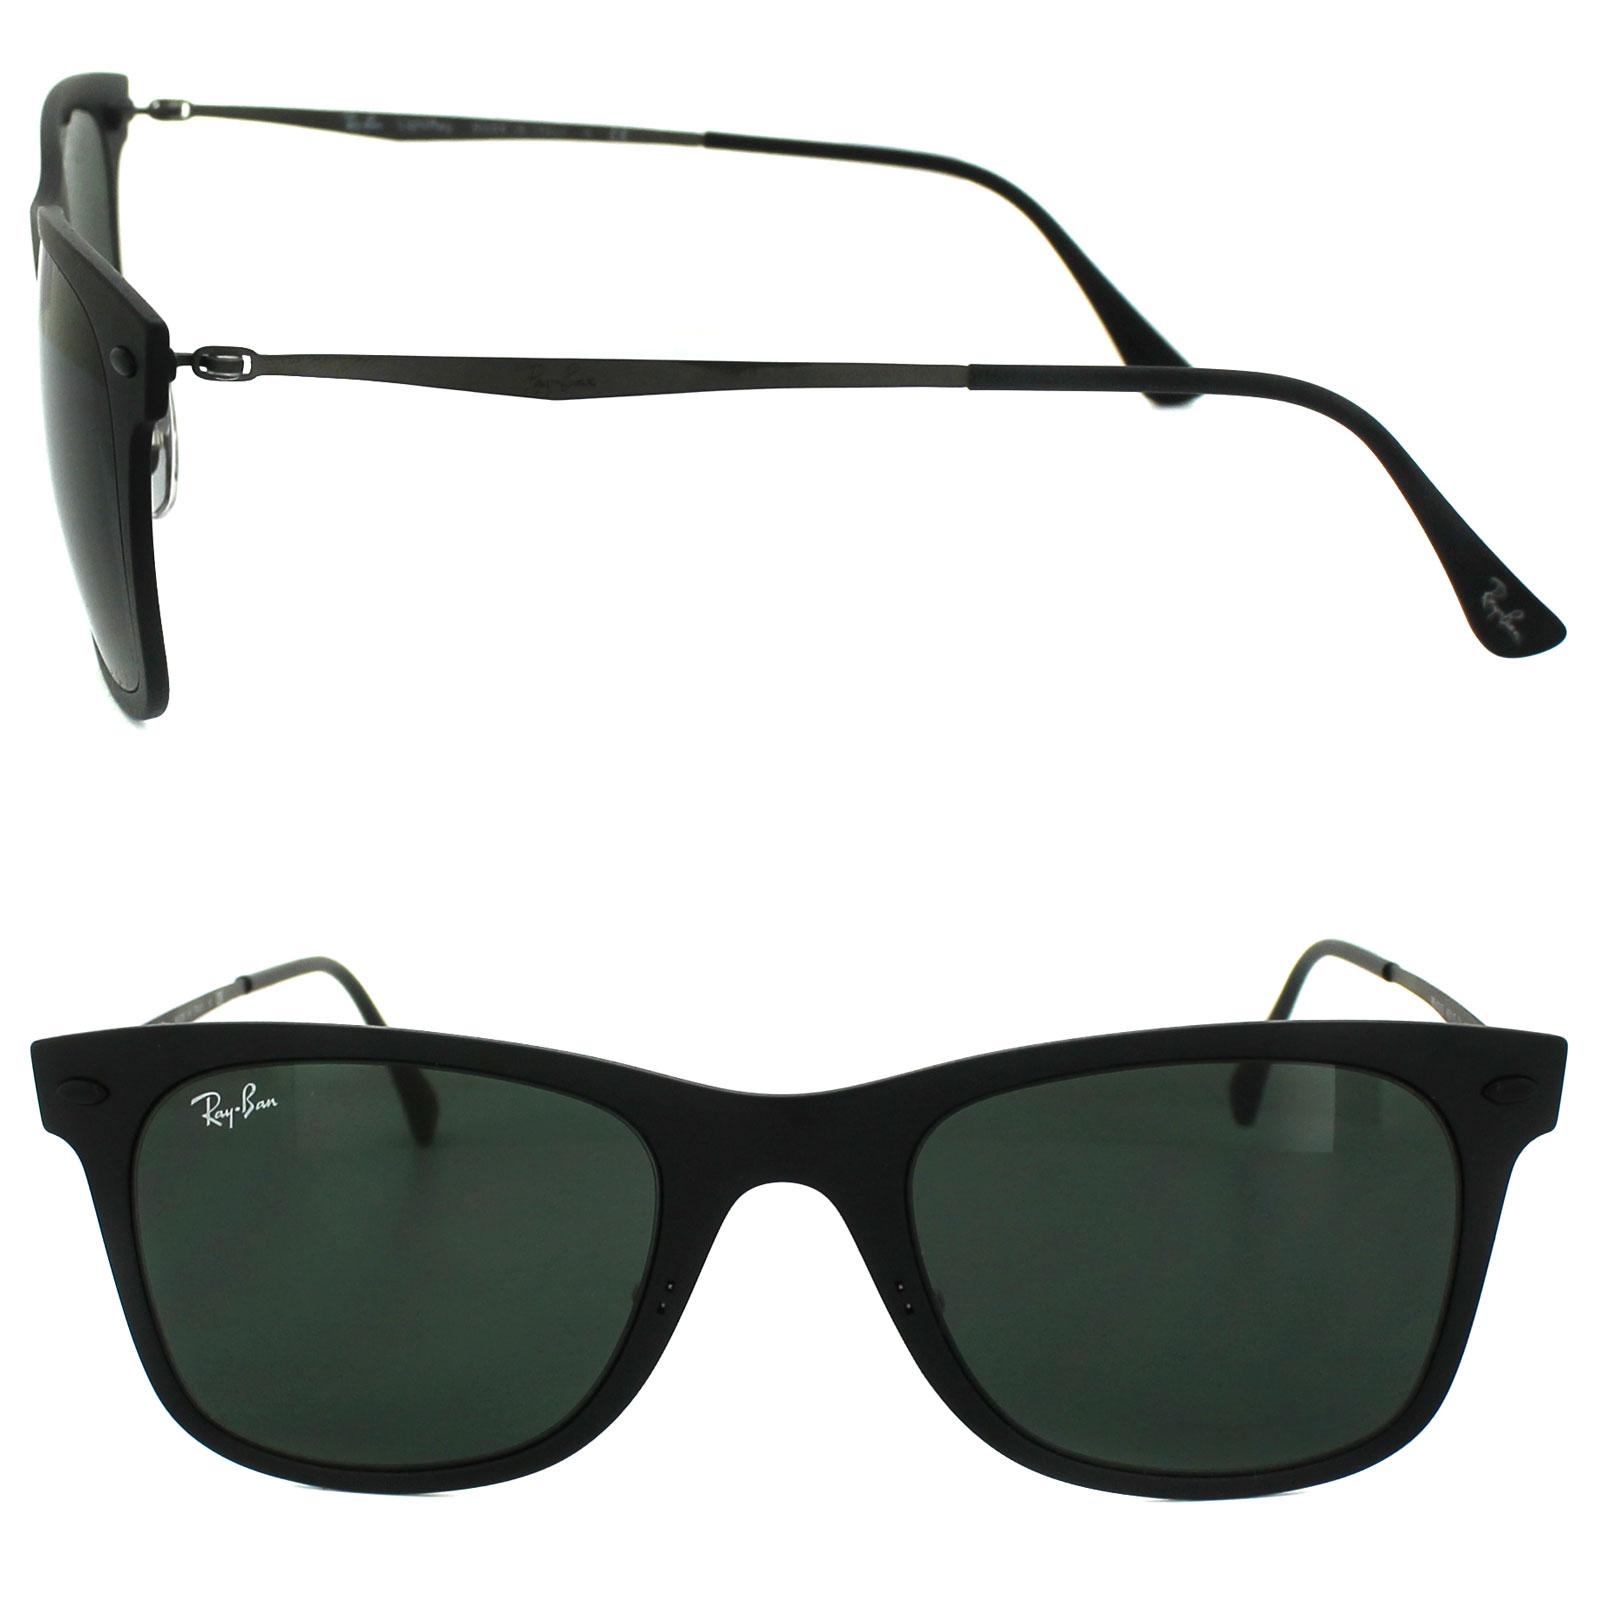 c7ca1670a5 Cheap Ray-Ban Wayfarer Light Ray 4210 Sunglasses - Discounted Sunglasses